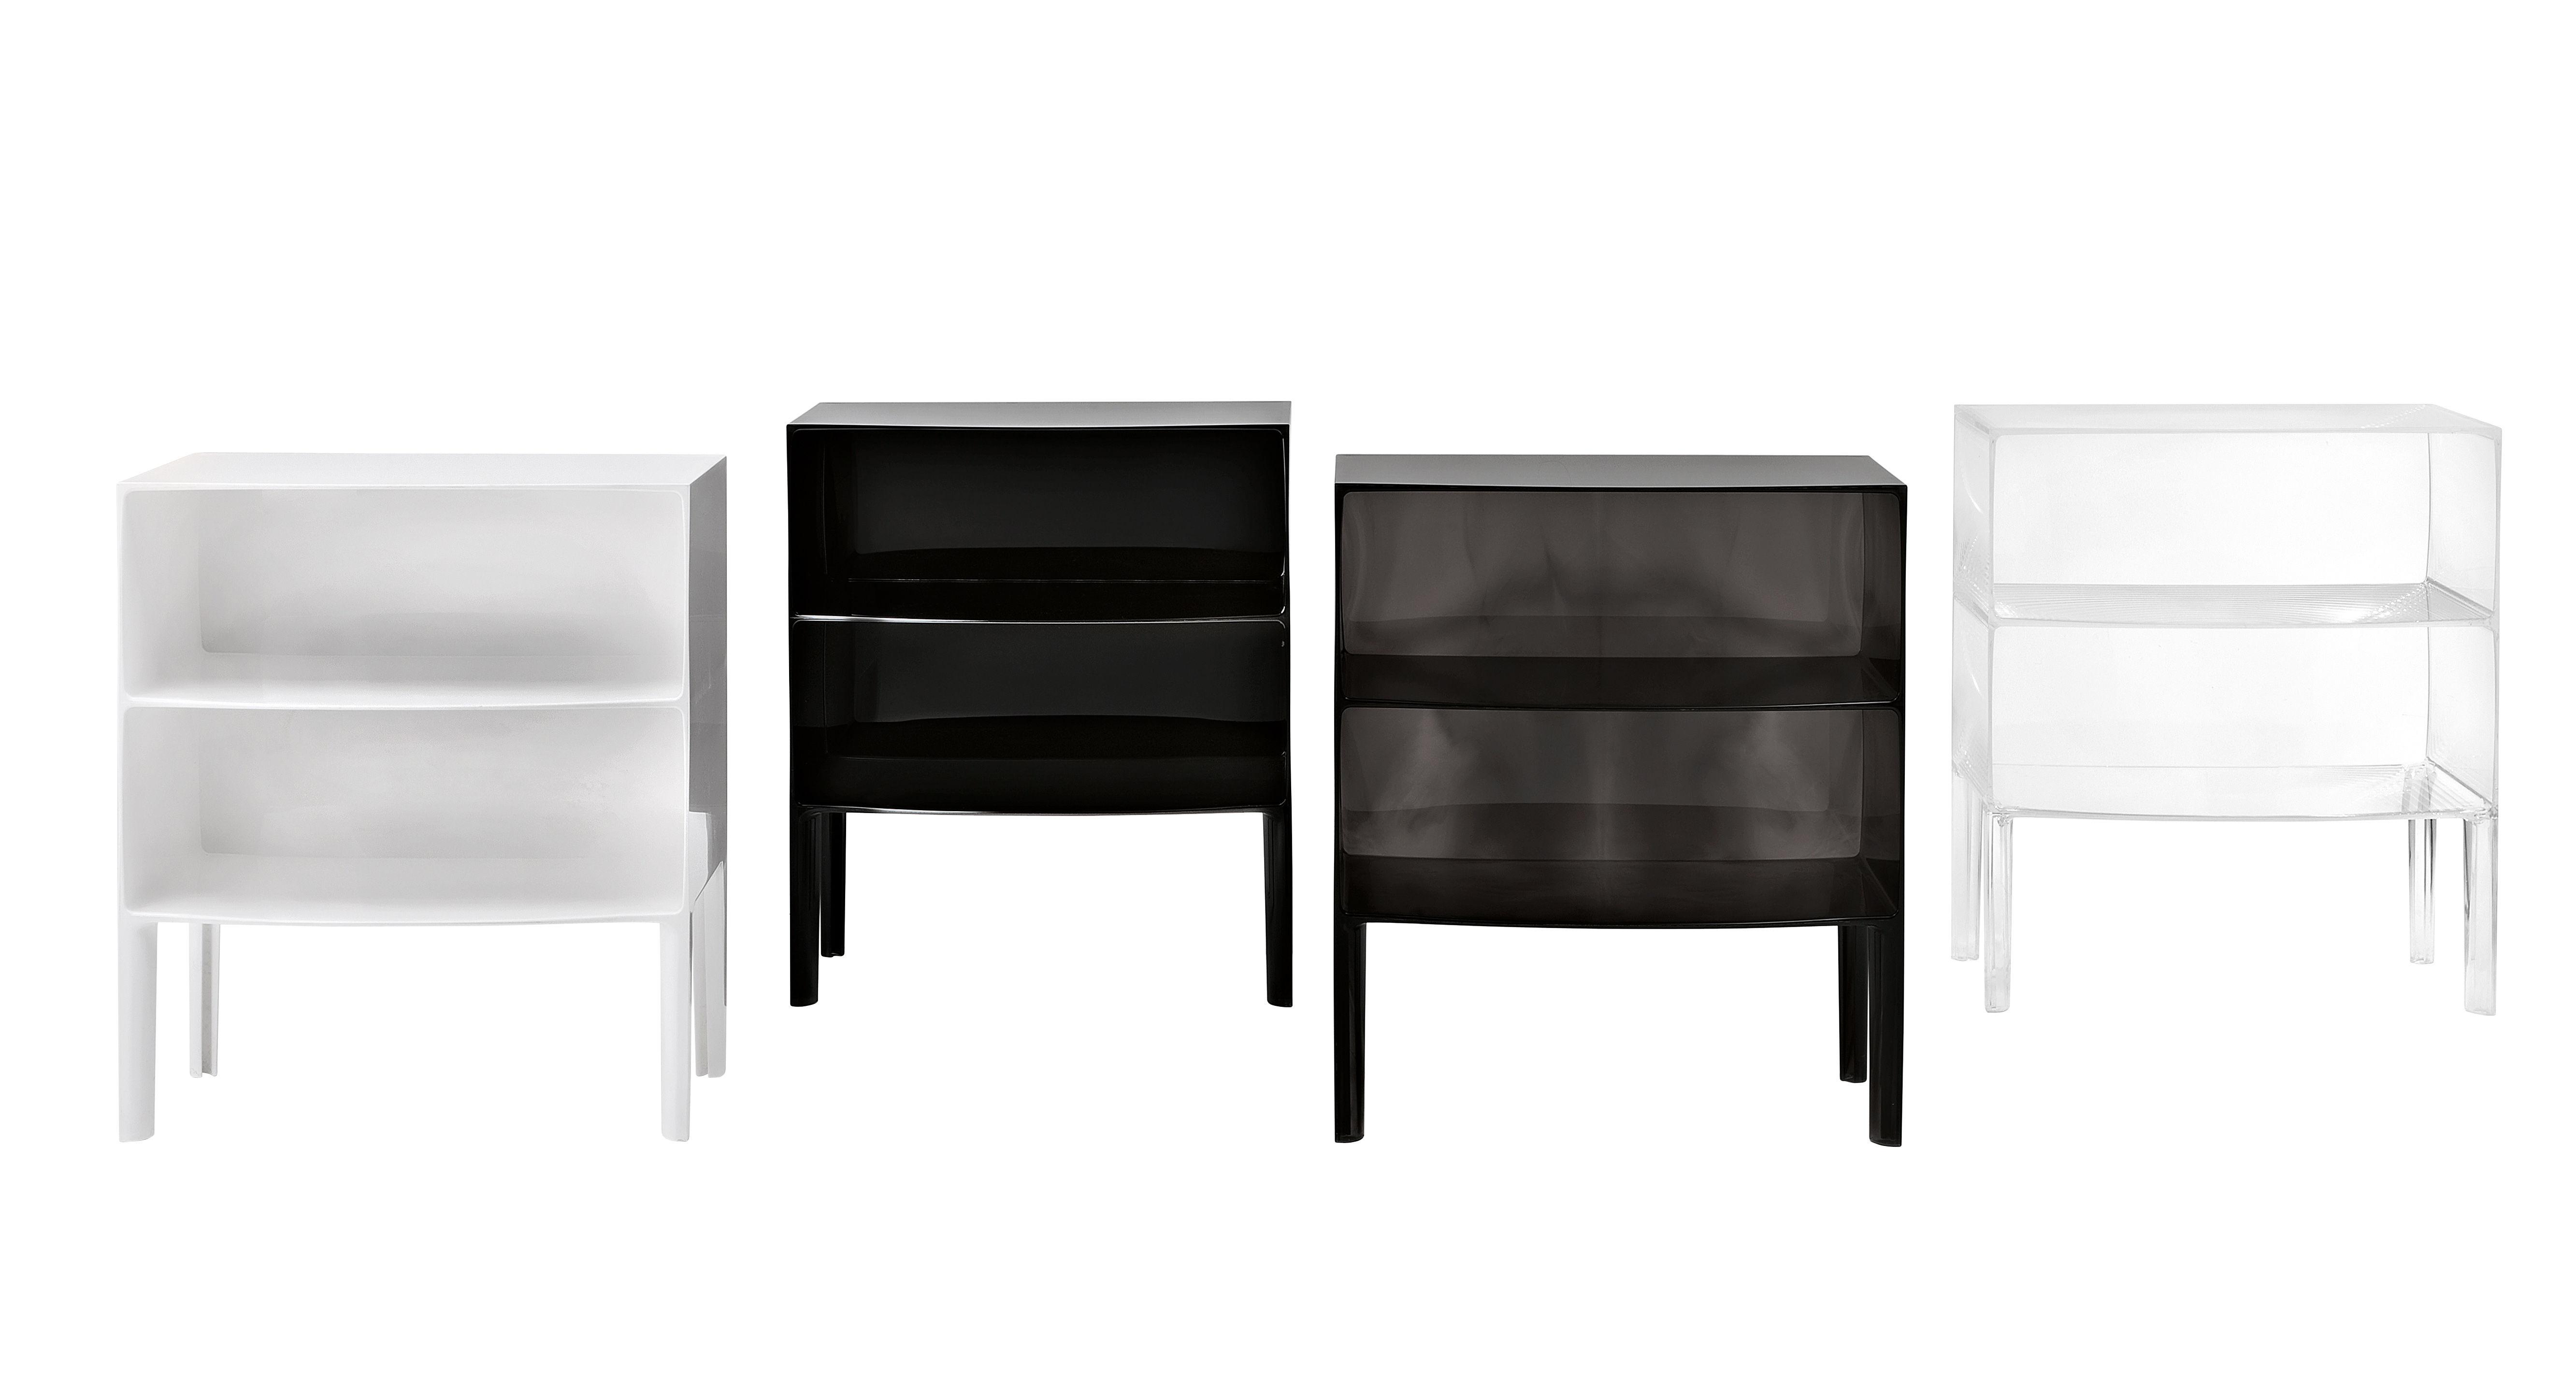 scopri com ghost buster trasparente di kartell made in design italia. Black Bedroom Furniture Sets. Home Design Ideas